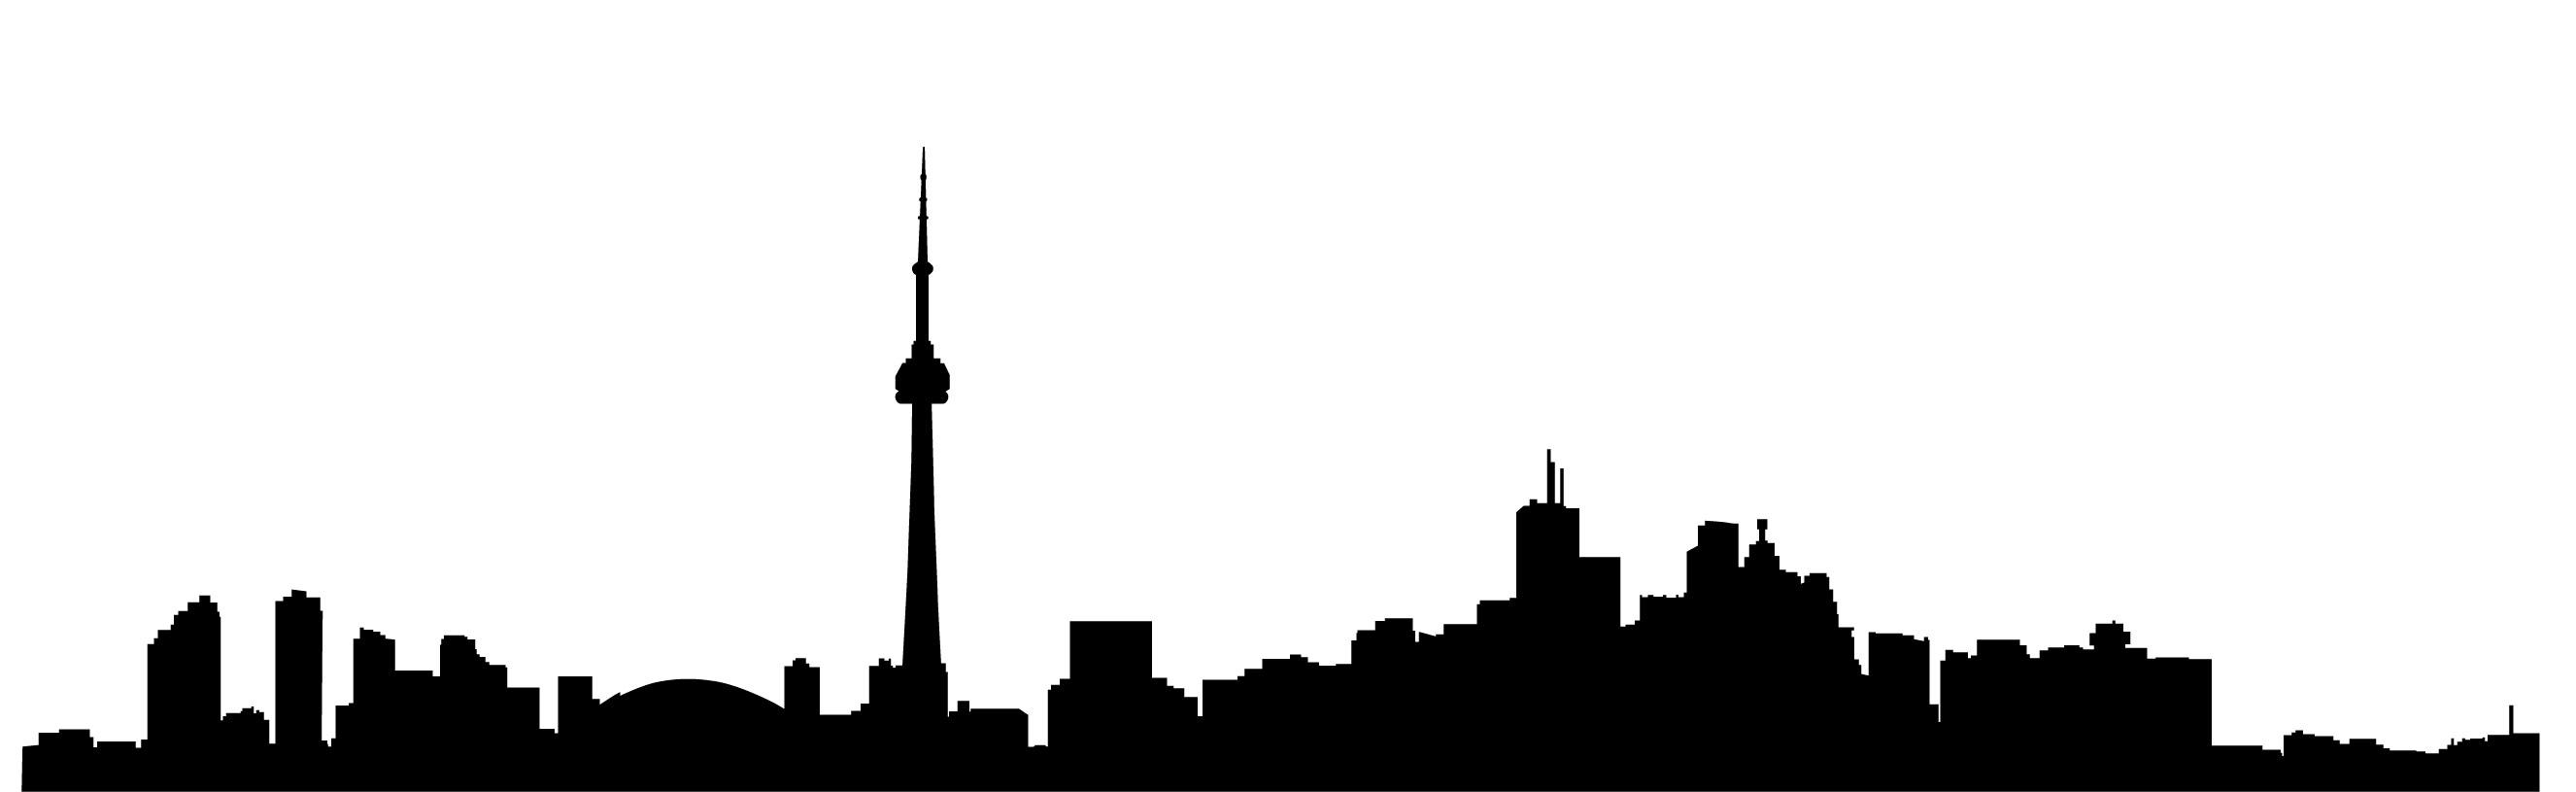 2652x815 Isra 2013, Toronto, Canada